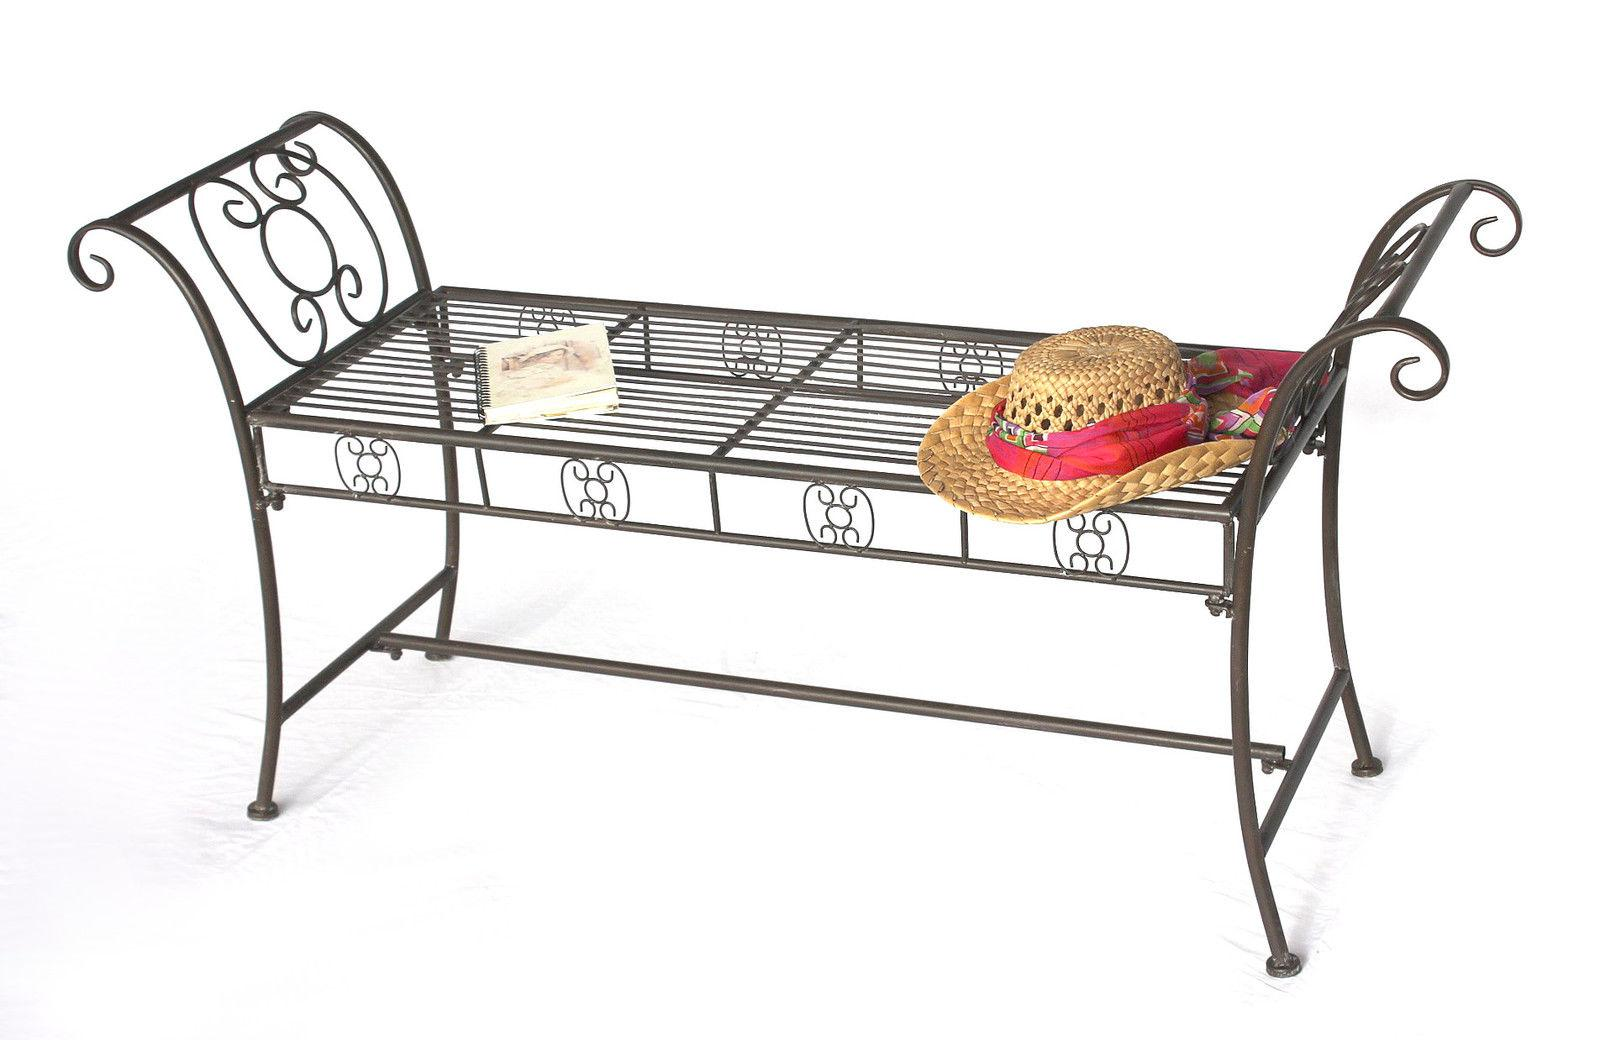 bank dy140491 aus metall gartenbank sitzbank 2 sitzer 138 cm rundbank parkbank ebay. Black Bedroom Furniture Sets. Home Design Ideas